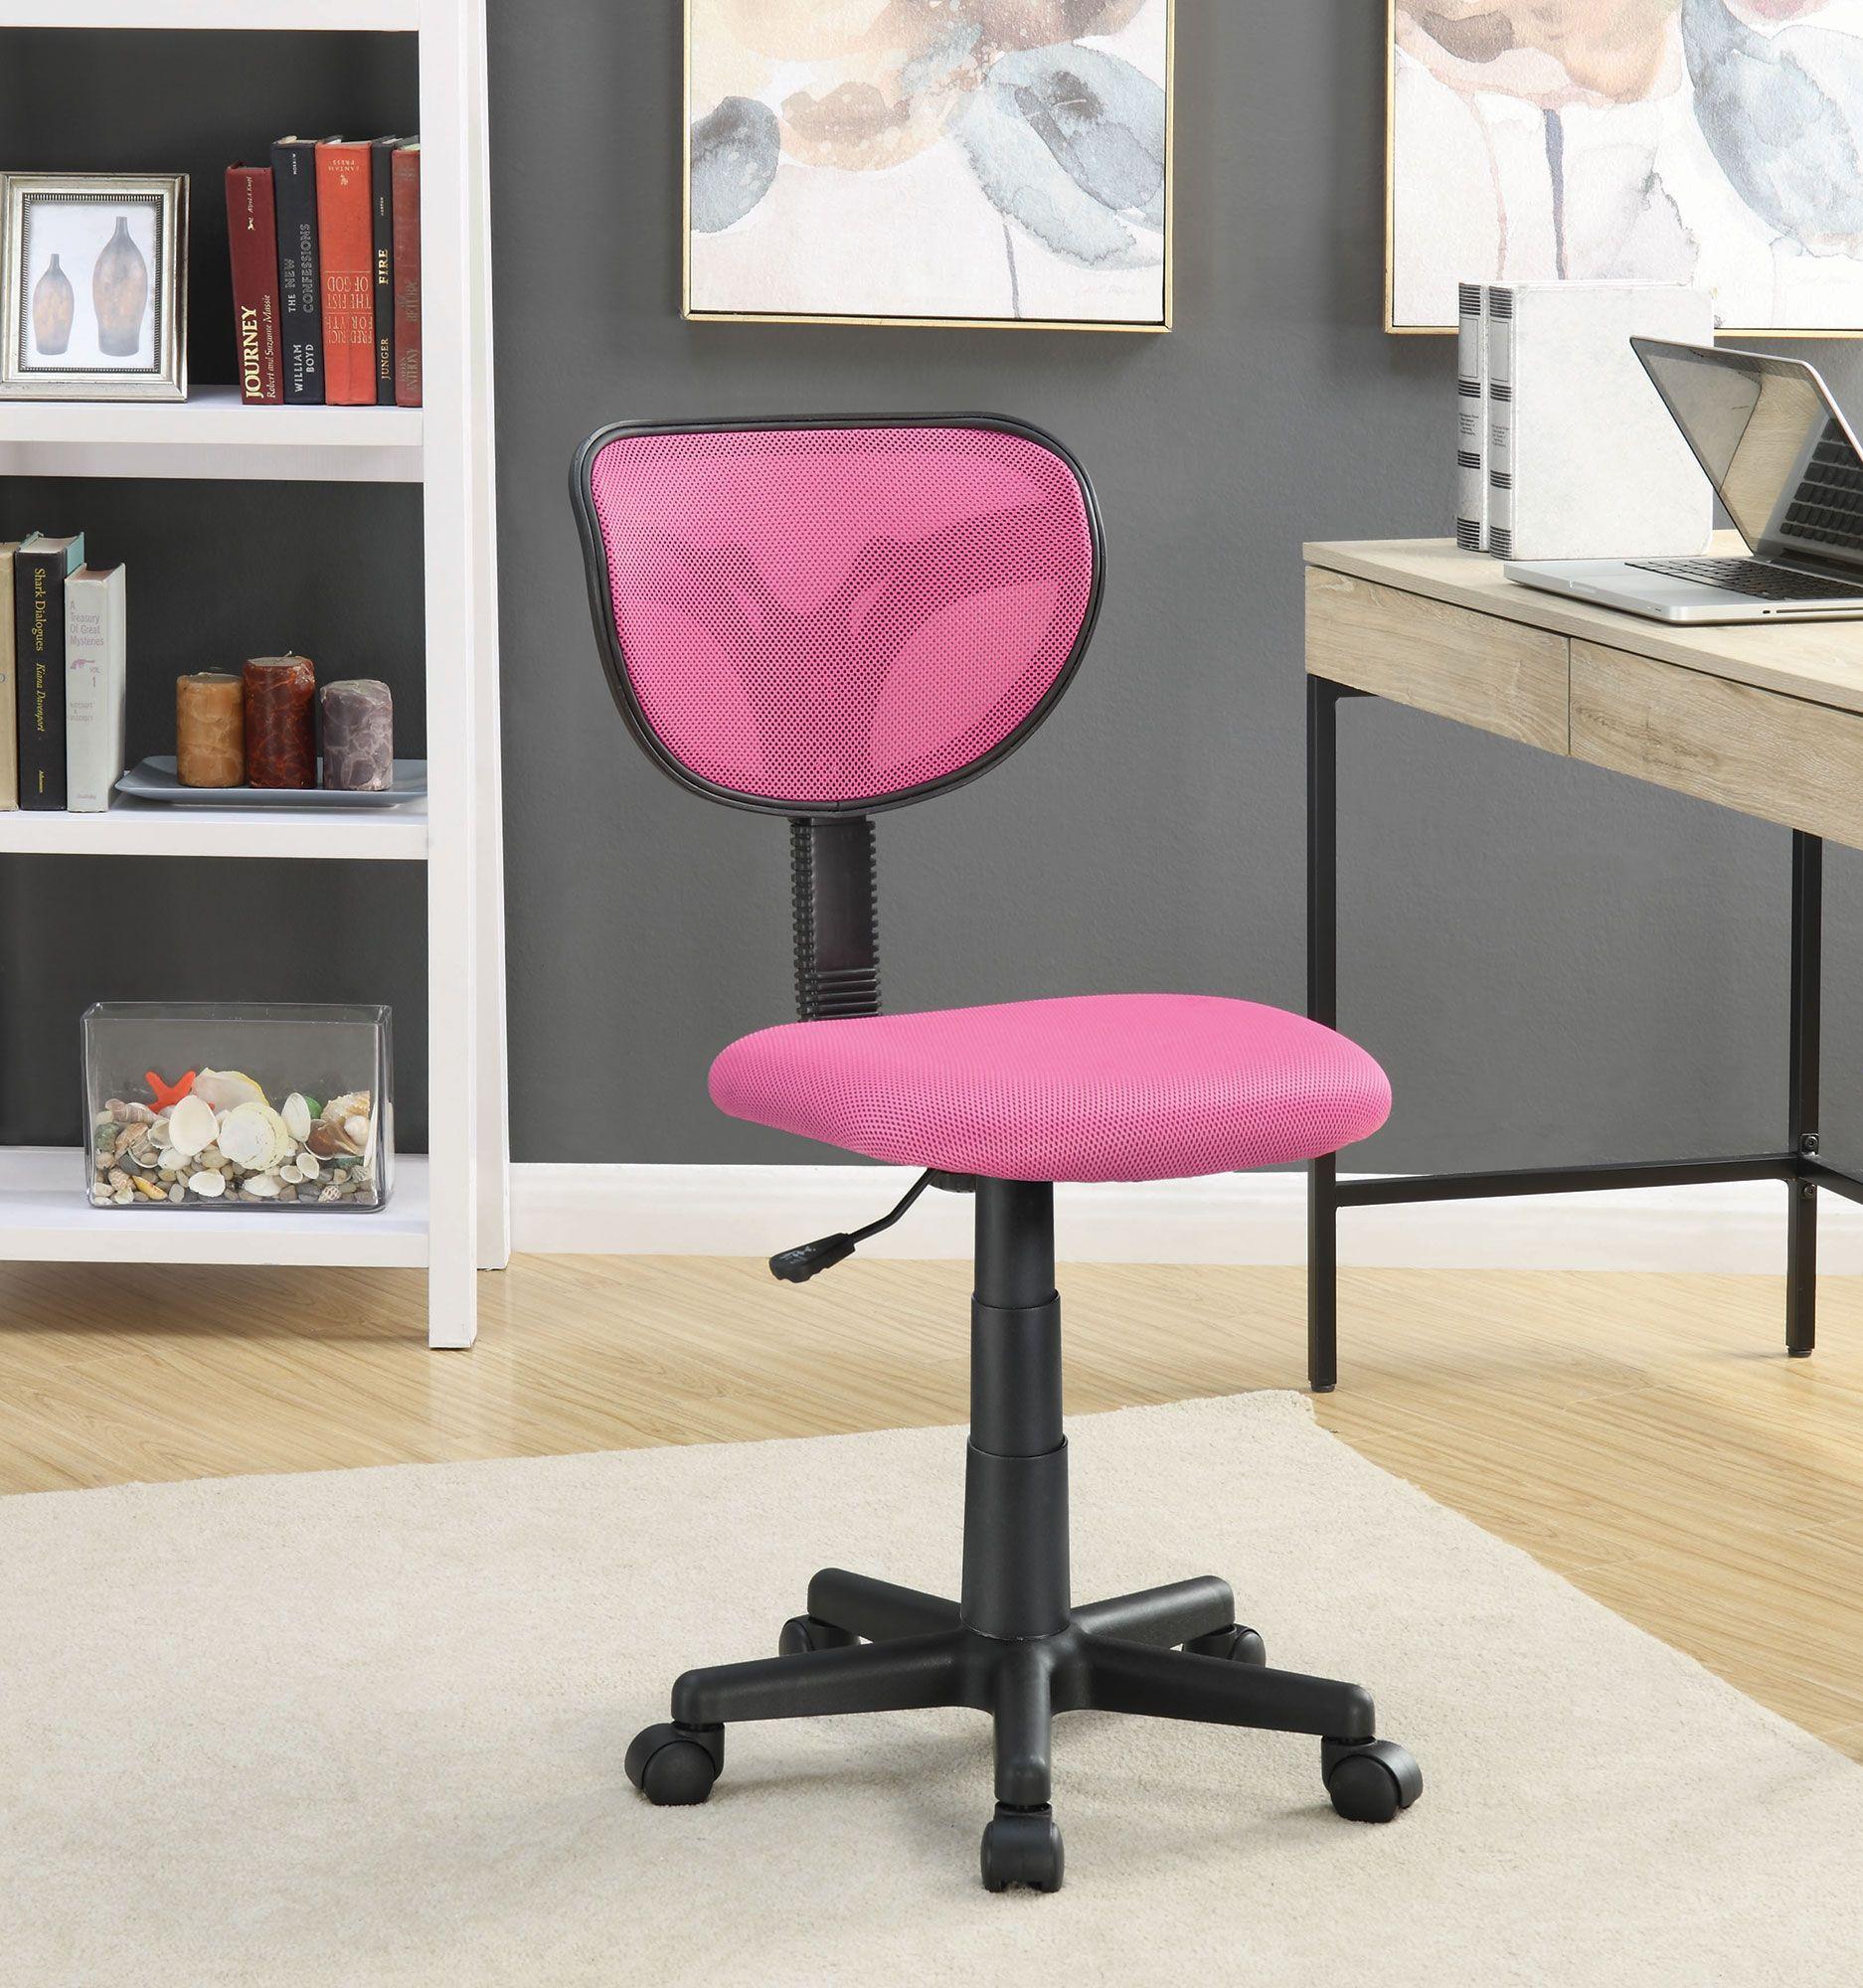 back mid task amazoncom chair adjustable office pink desk home l